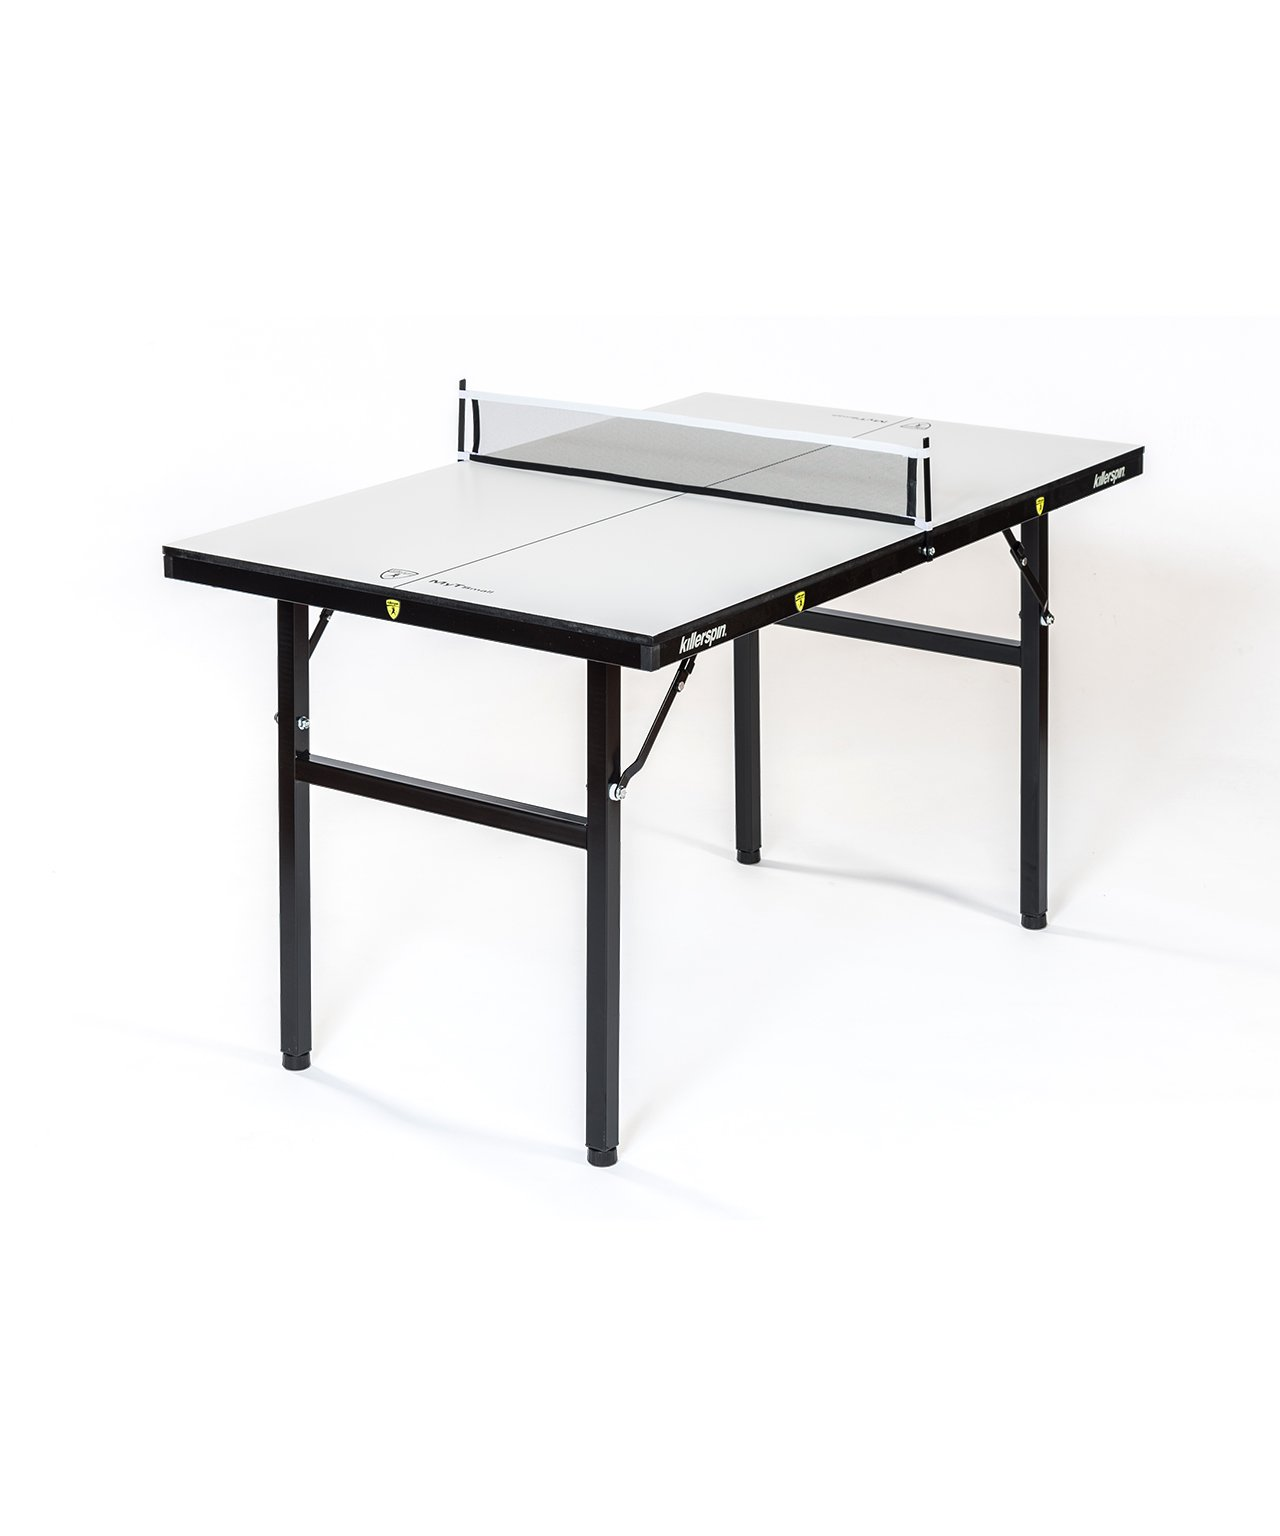 Killerspin MyT Small Vanillaswirl Table Tennis Table